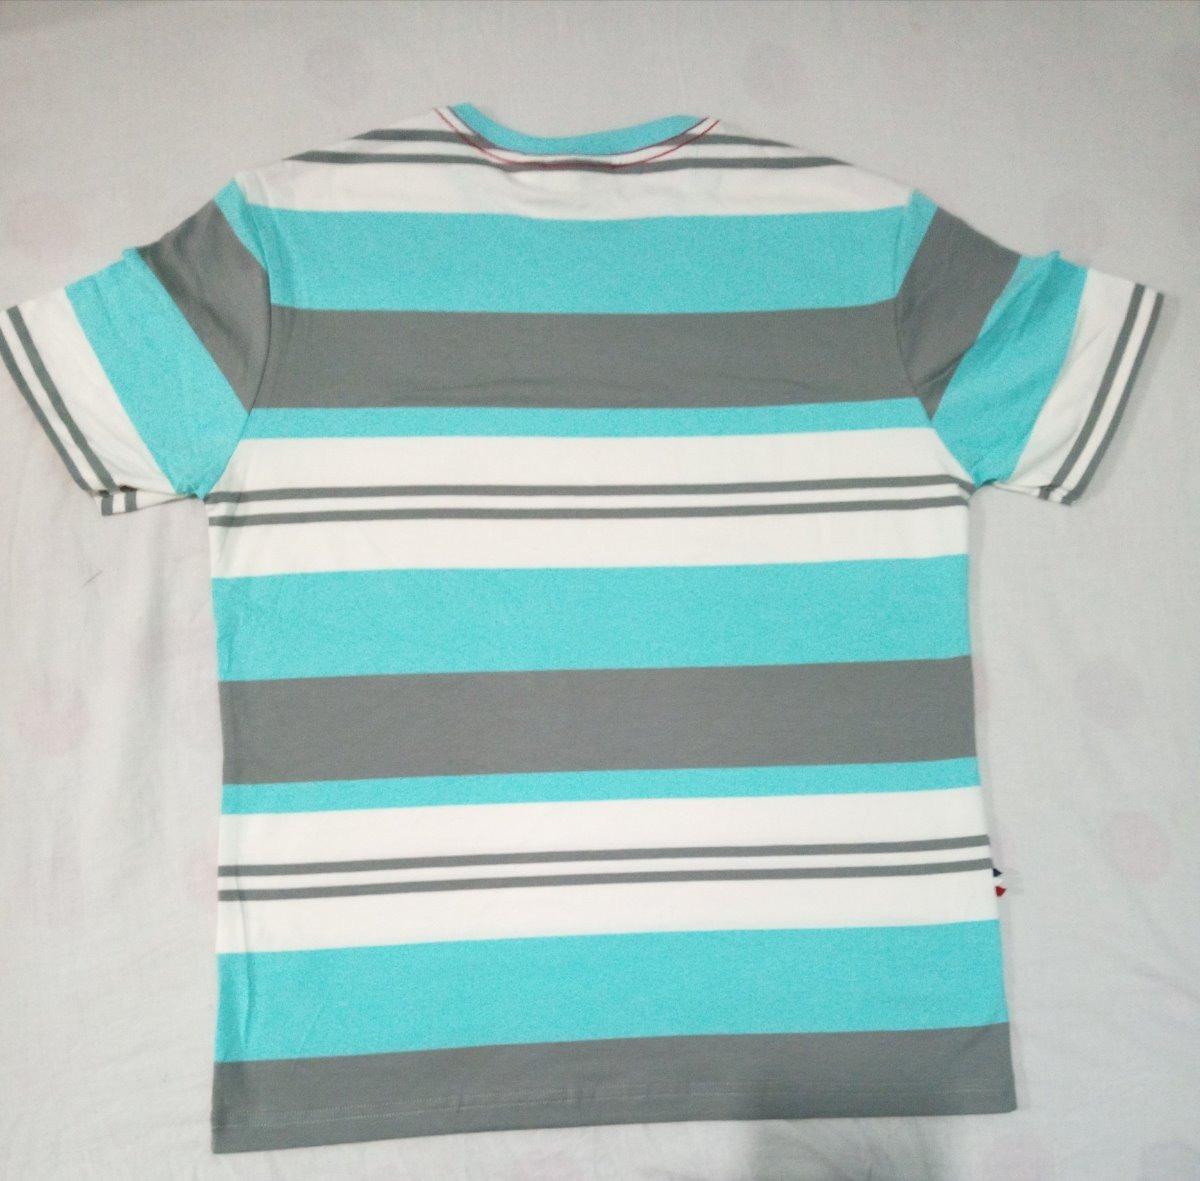 07660ee7b19d7 camisa masculina lacoste listrada oakley. Carregando zoom.